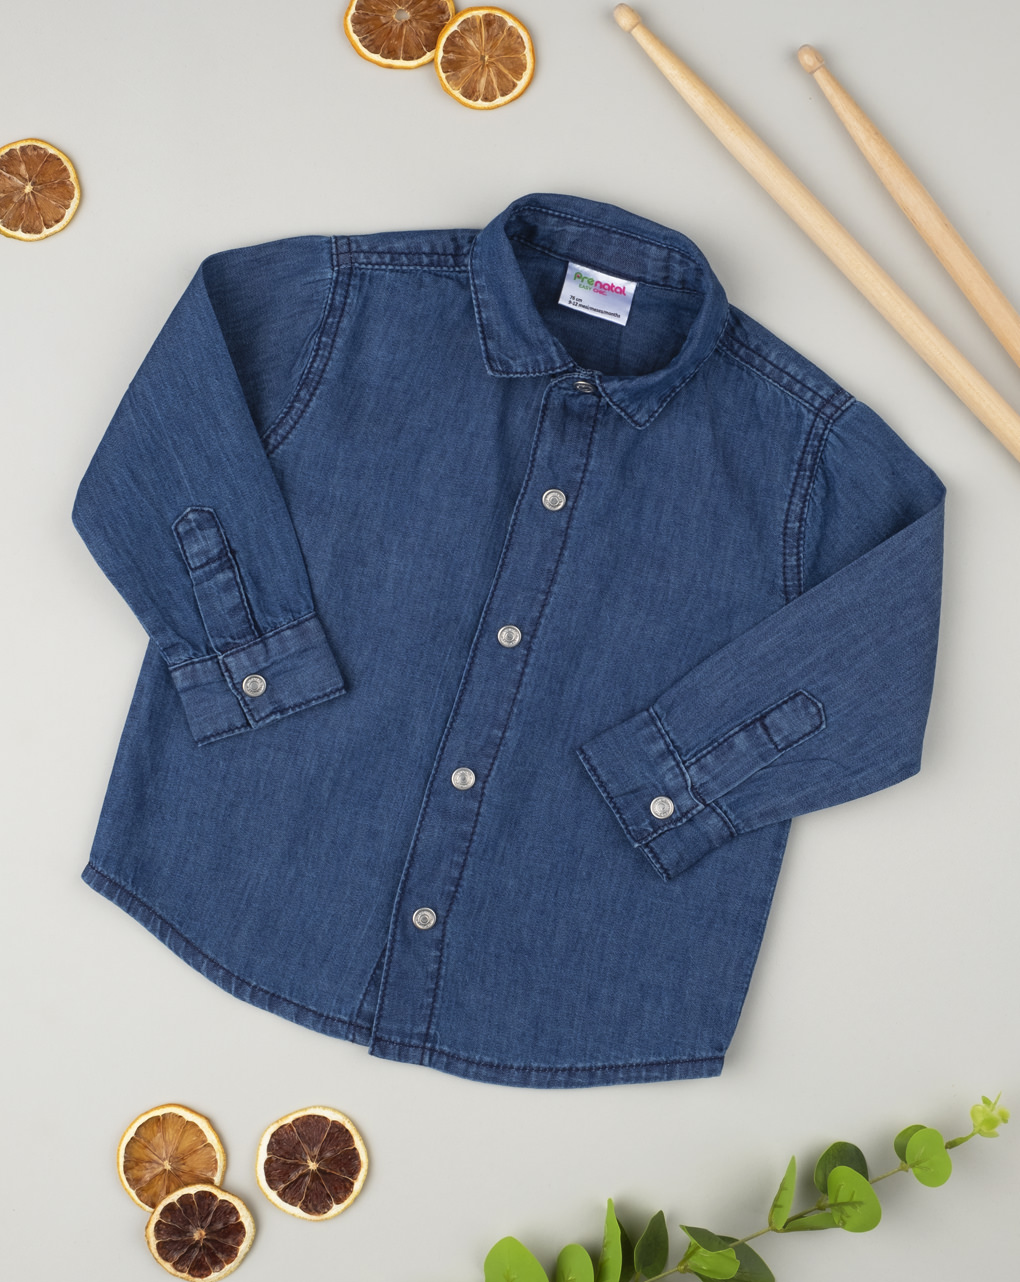 Camisa jeans menino - Prénatal